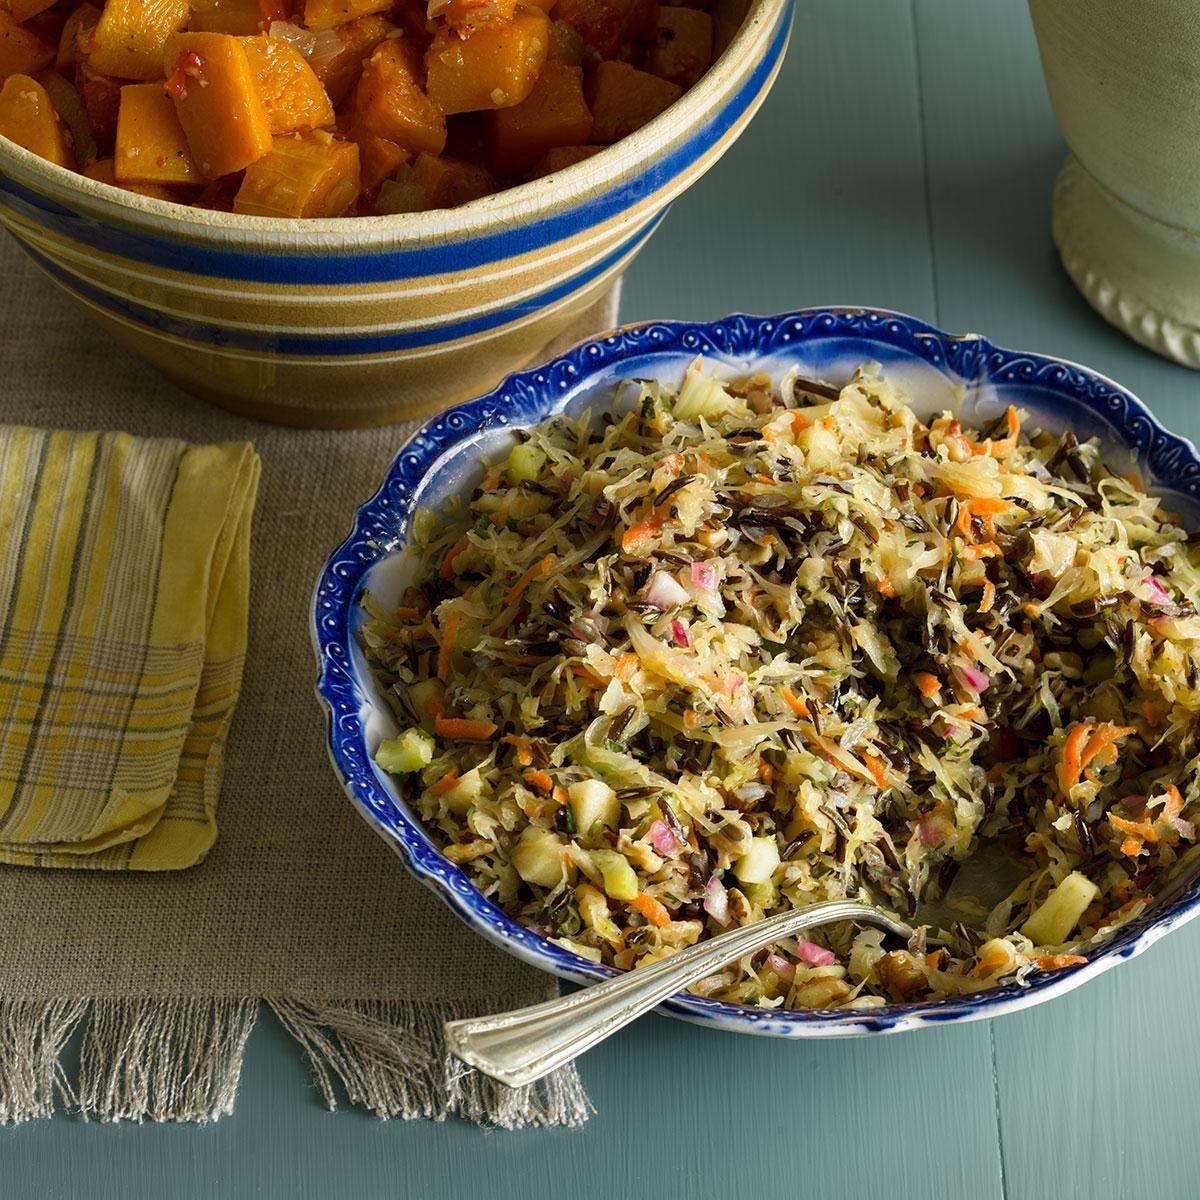 Minnesota: Northwoods Wild Rice Salad